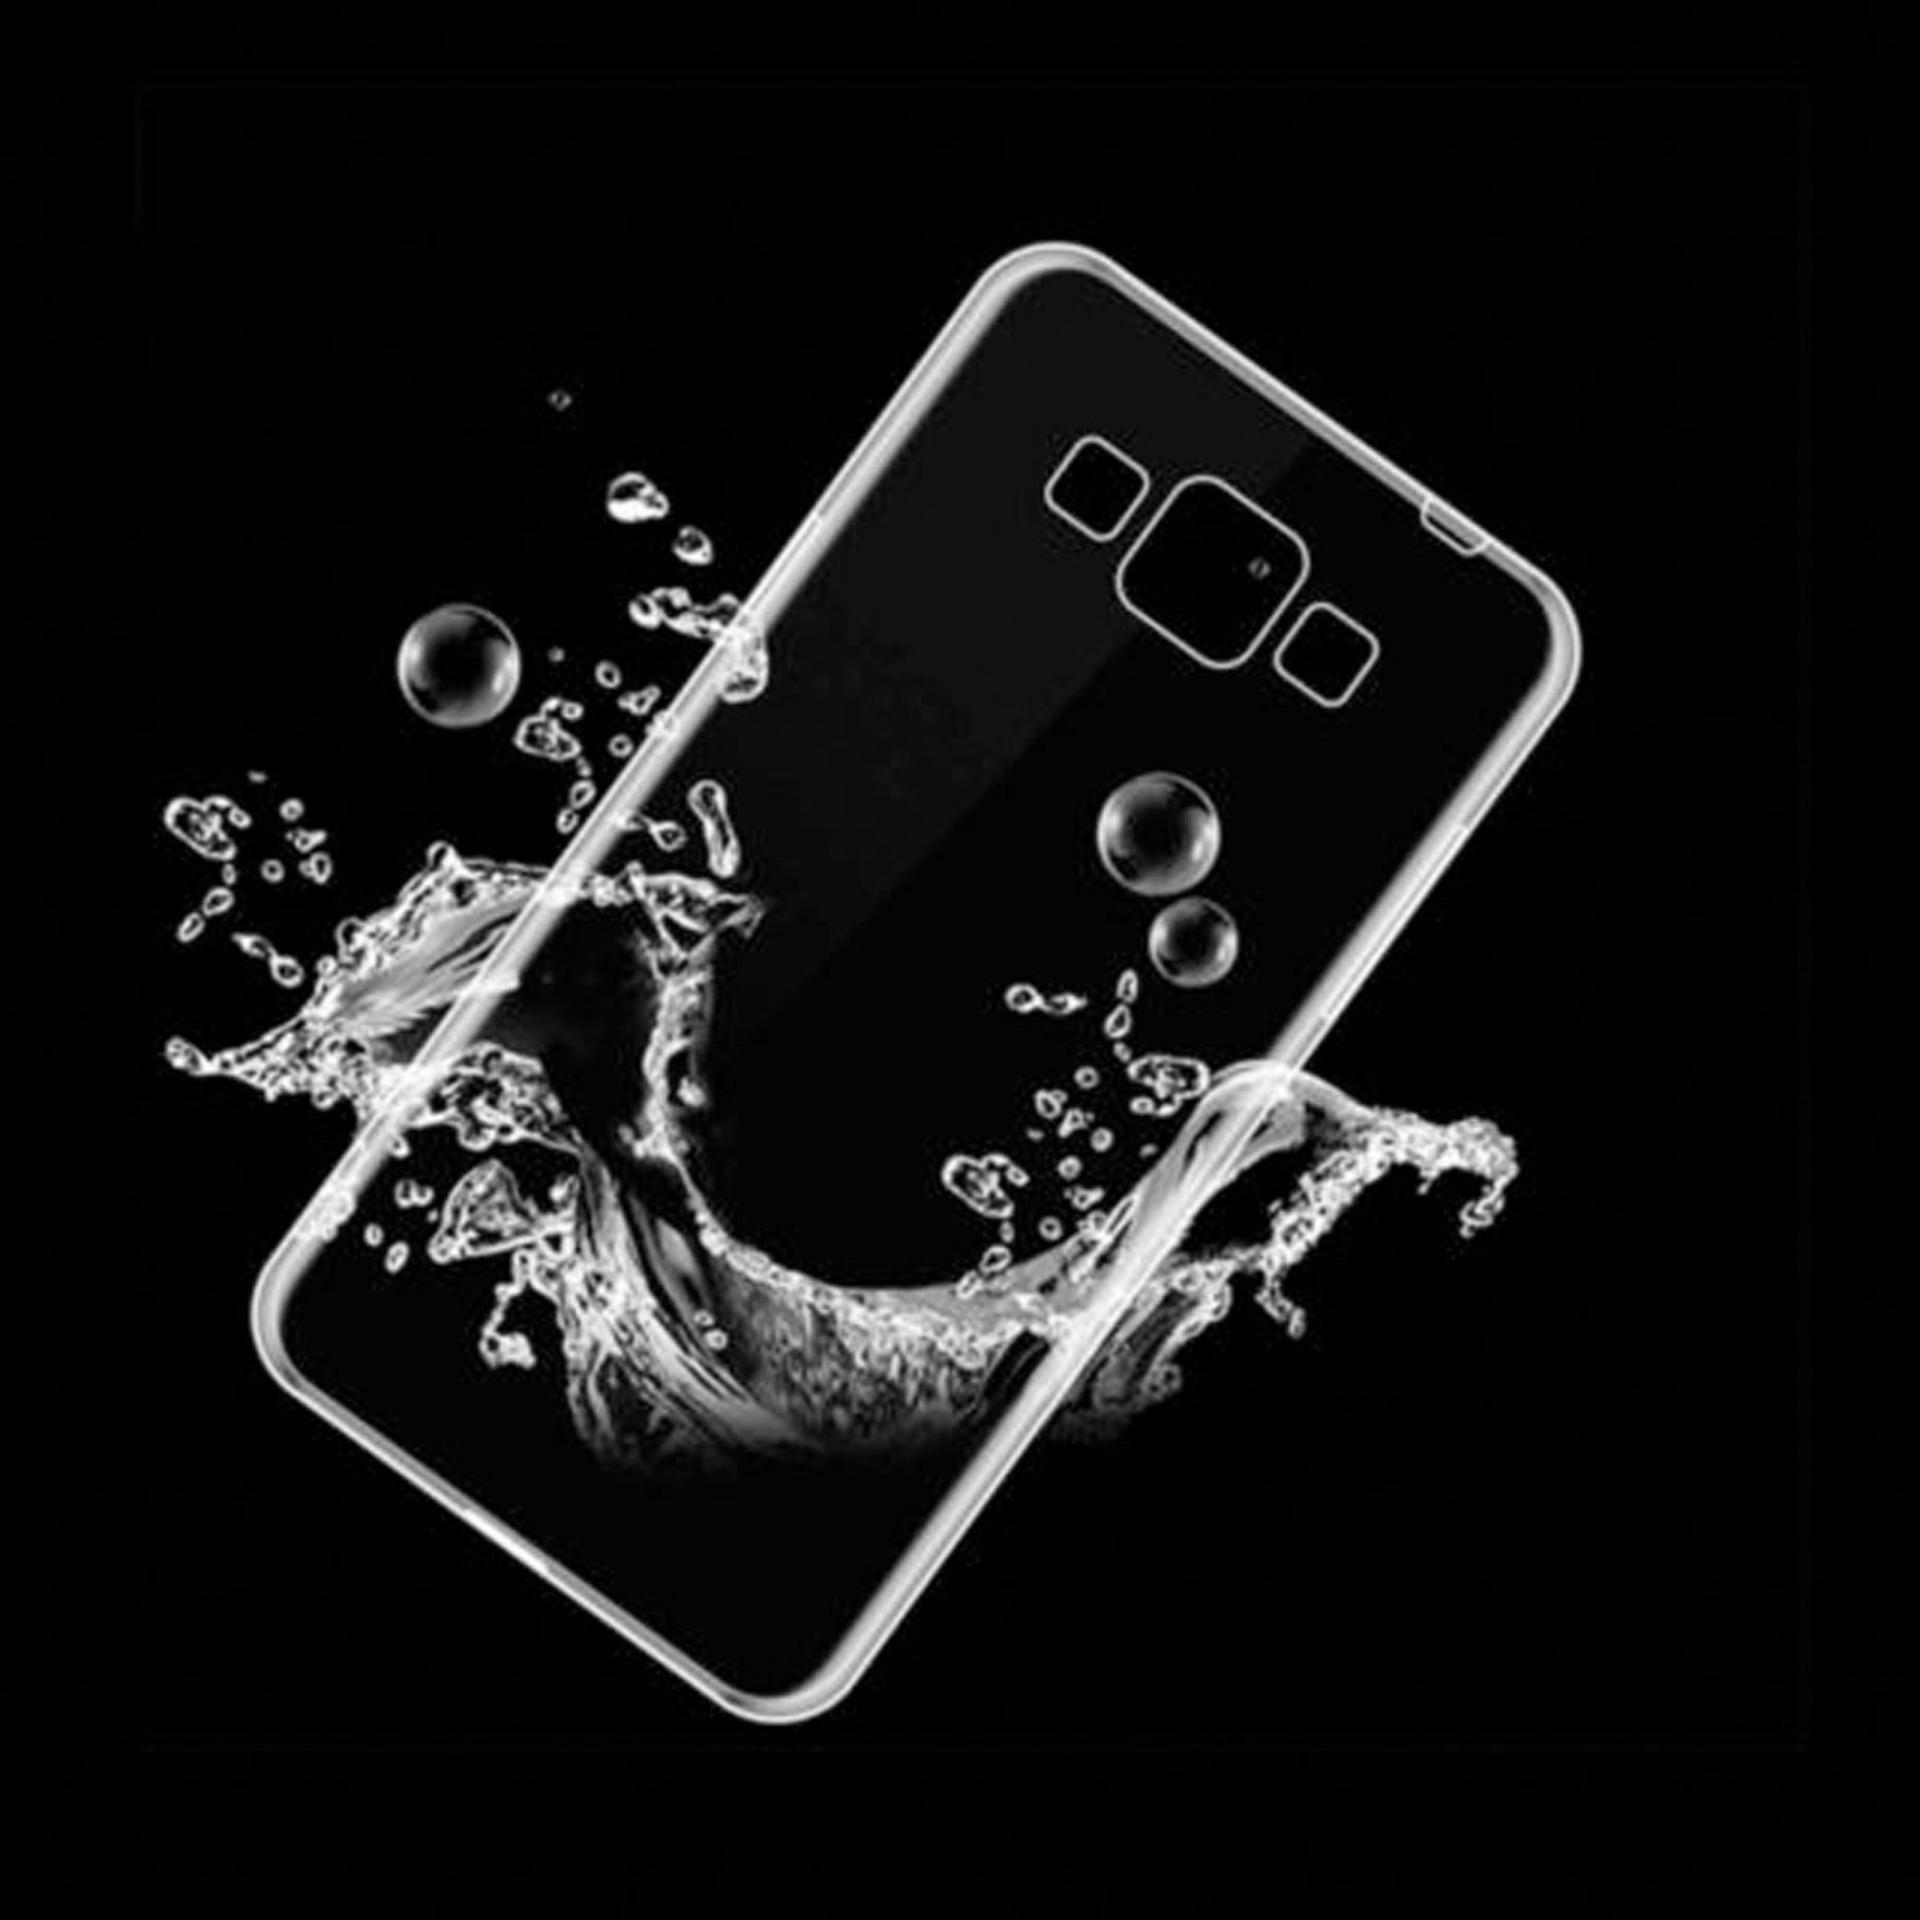 Cek Harga Baru Ume Samsung Galaxy A5 2016 A510 Backdoor Tutup Casing Belakang Ultrathin